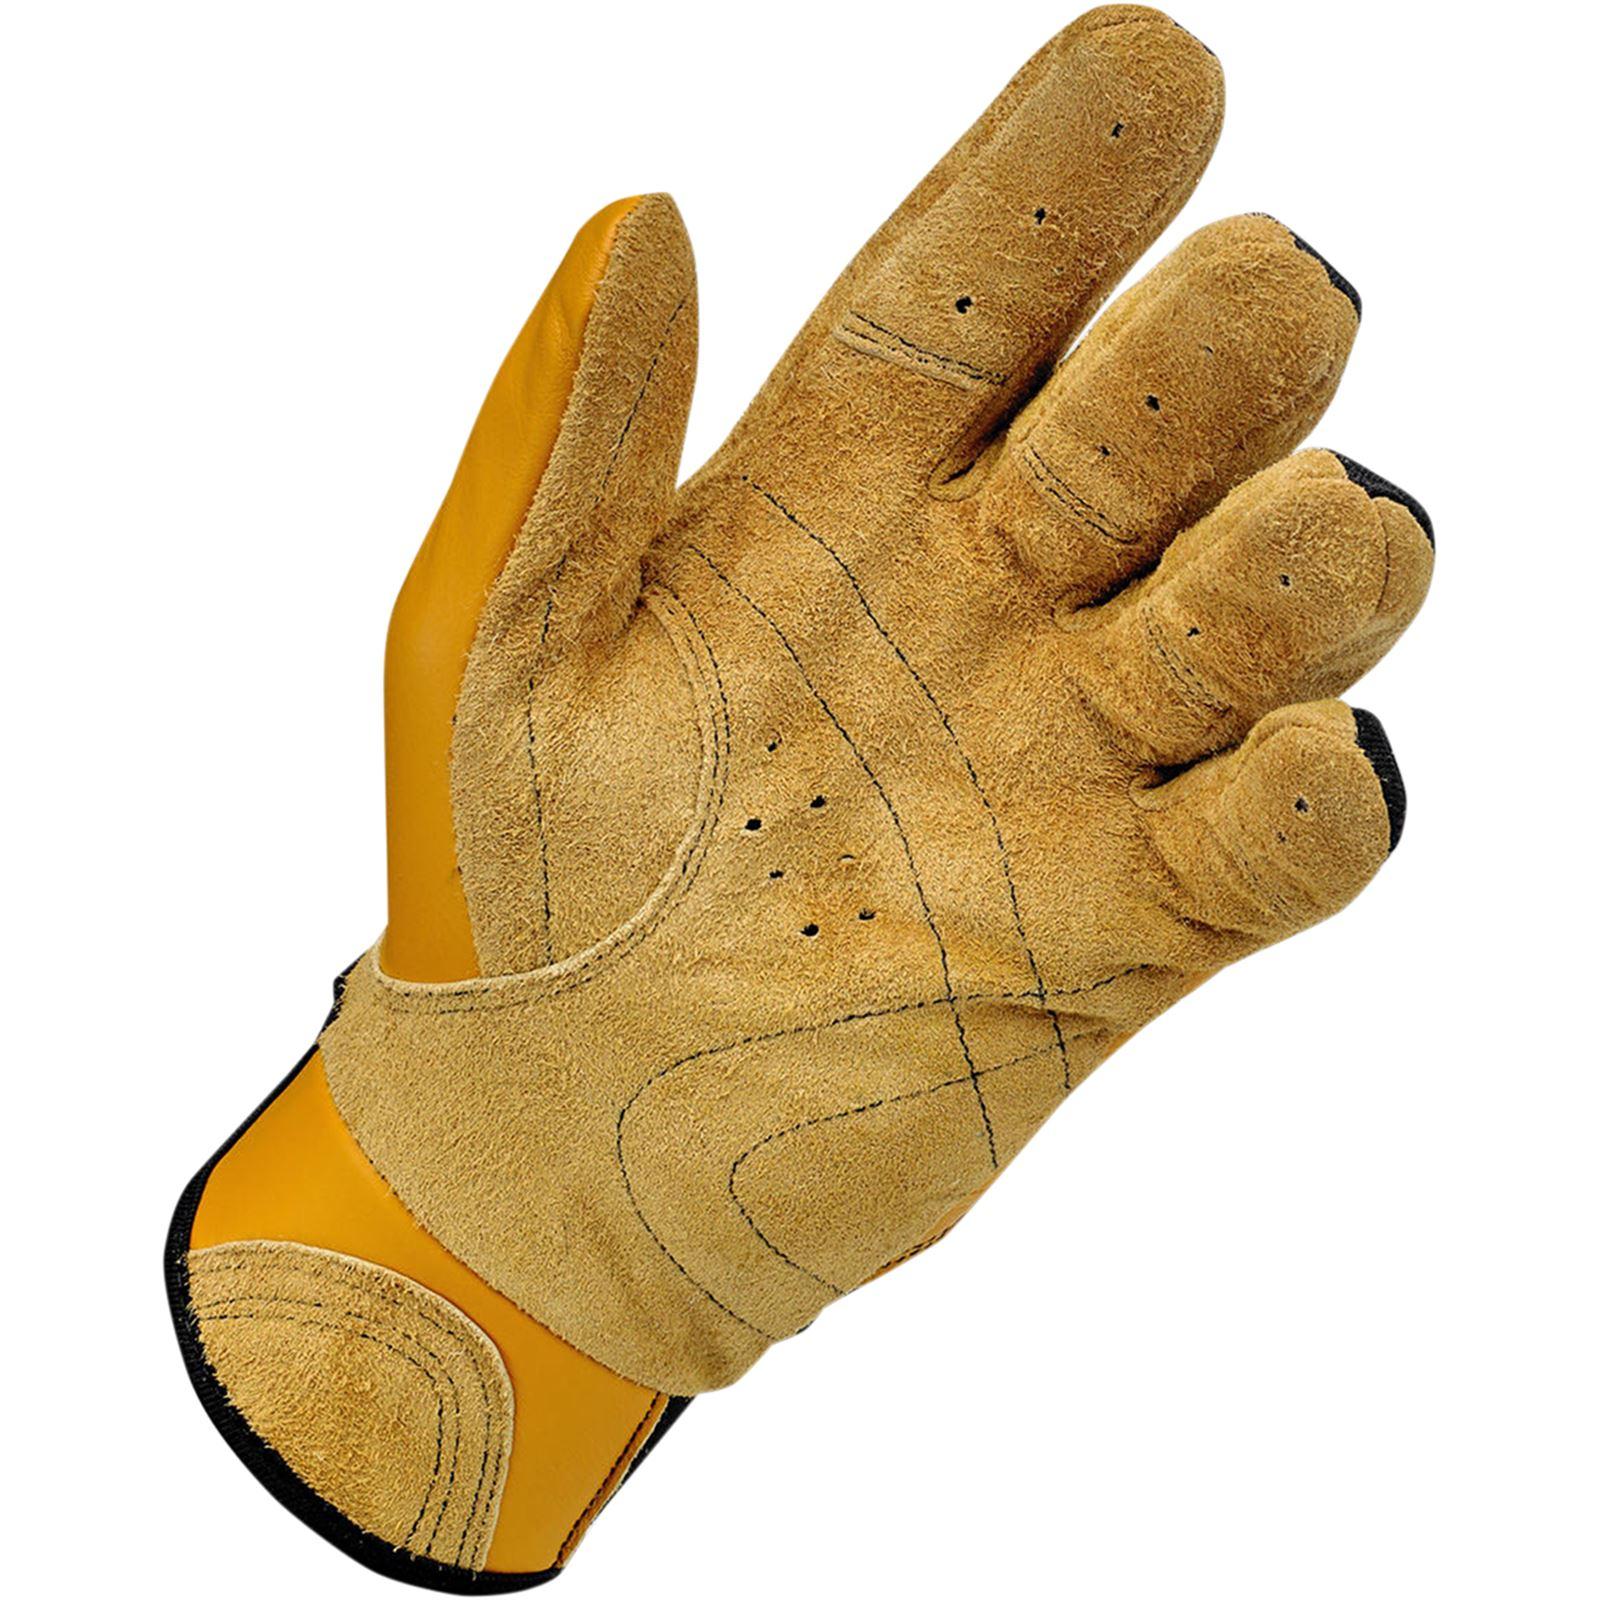 Biltwell Inc. Bantam Gloves - Tan/Black - Large